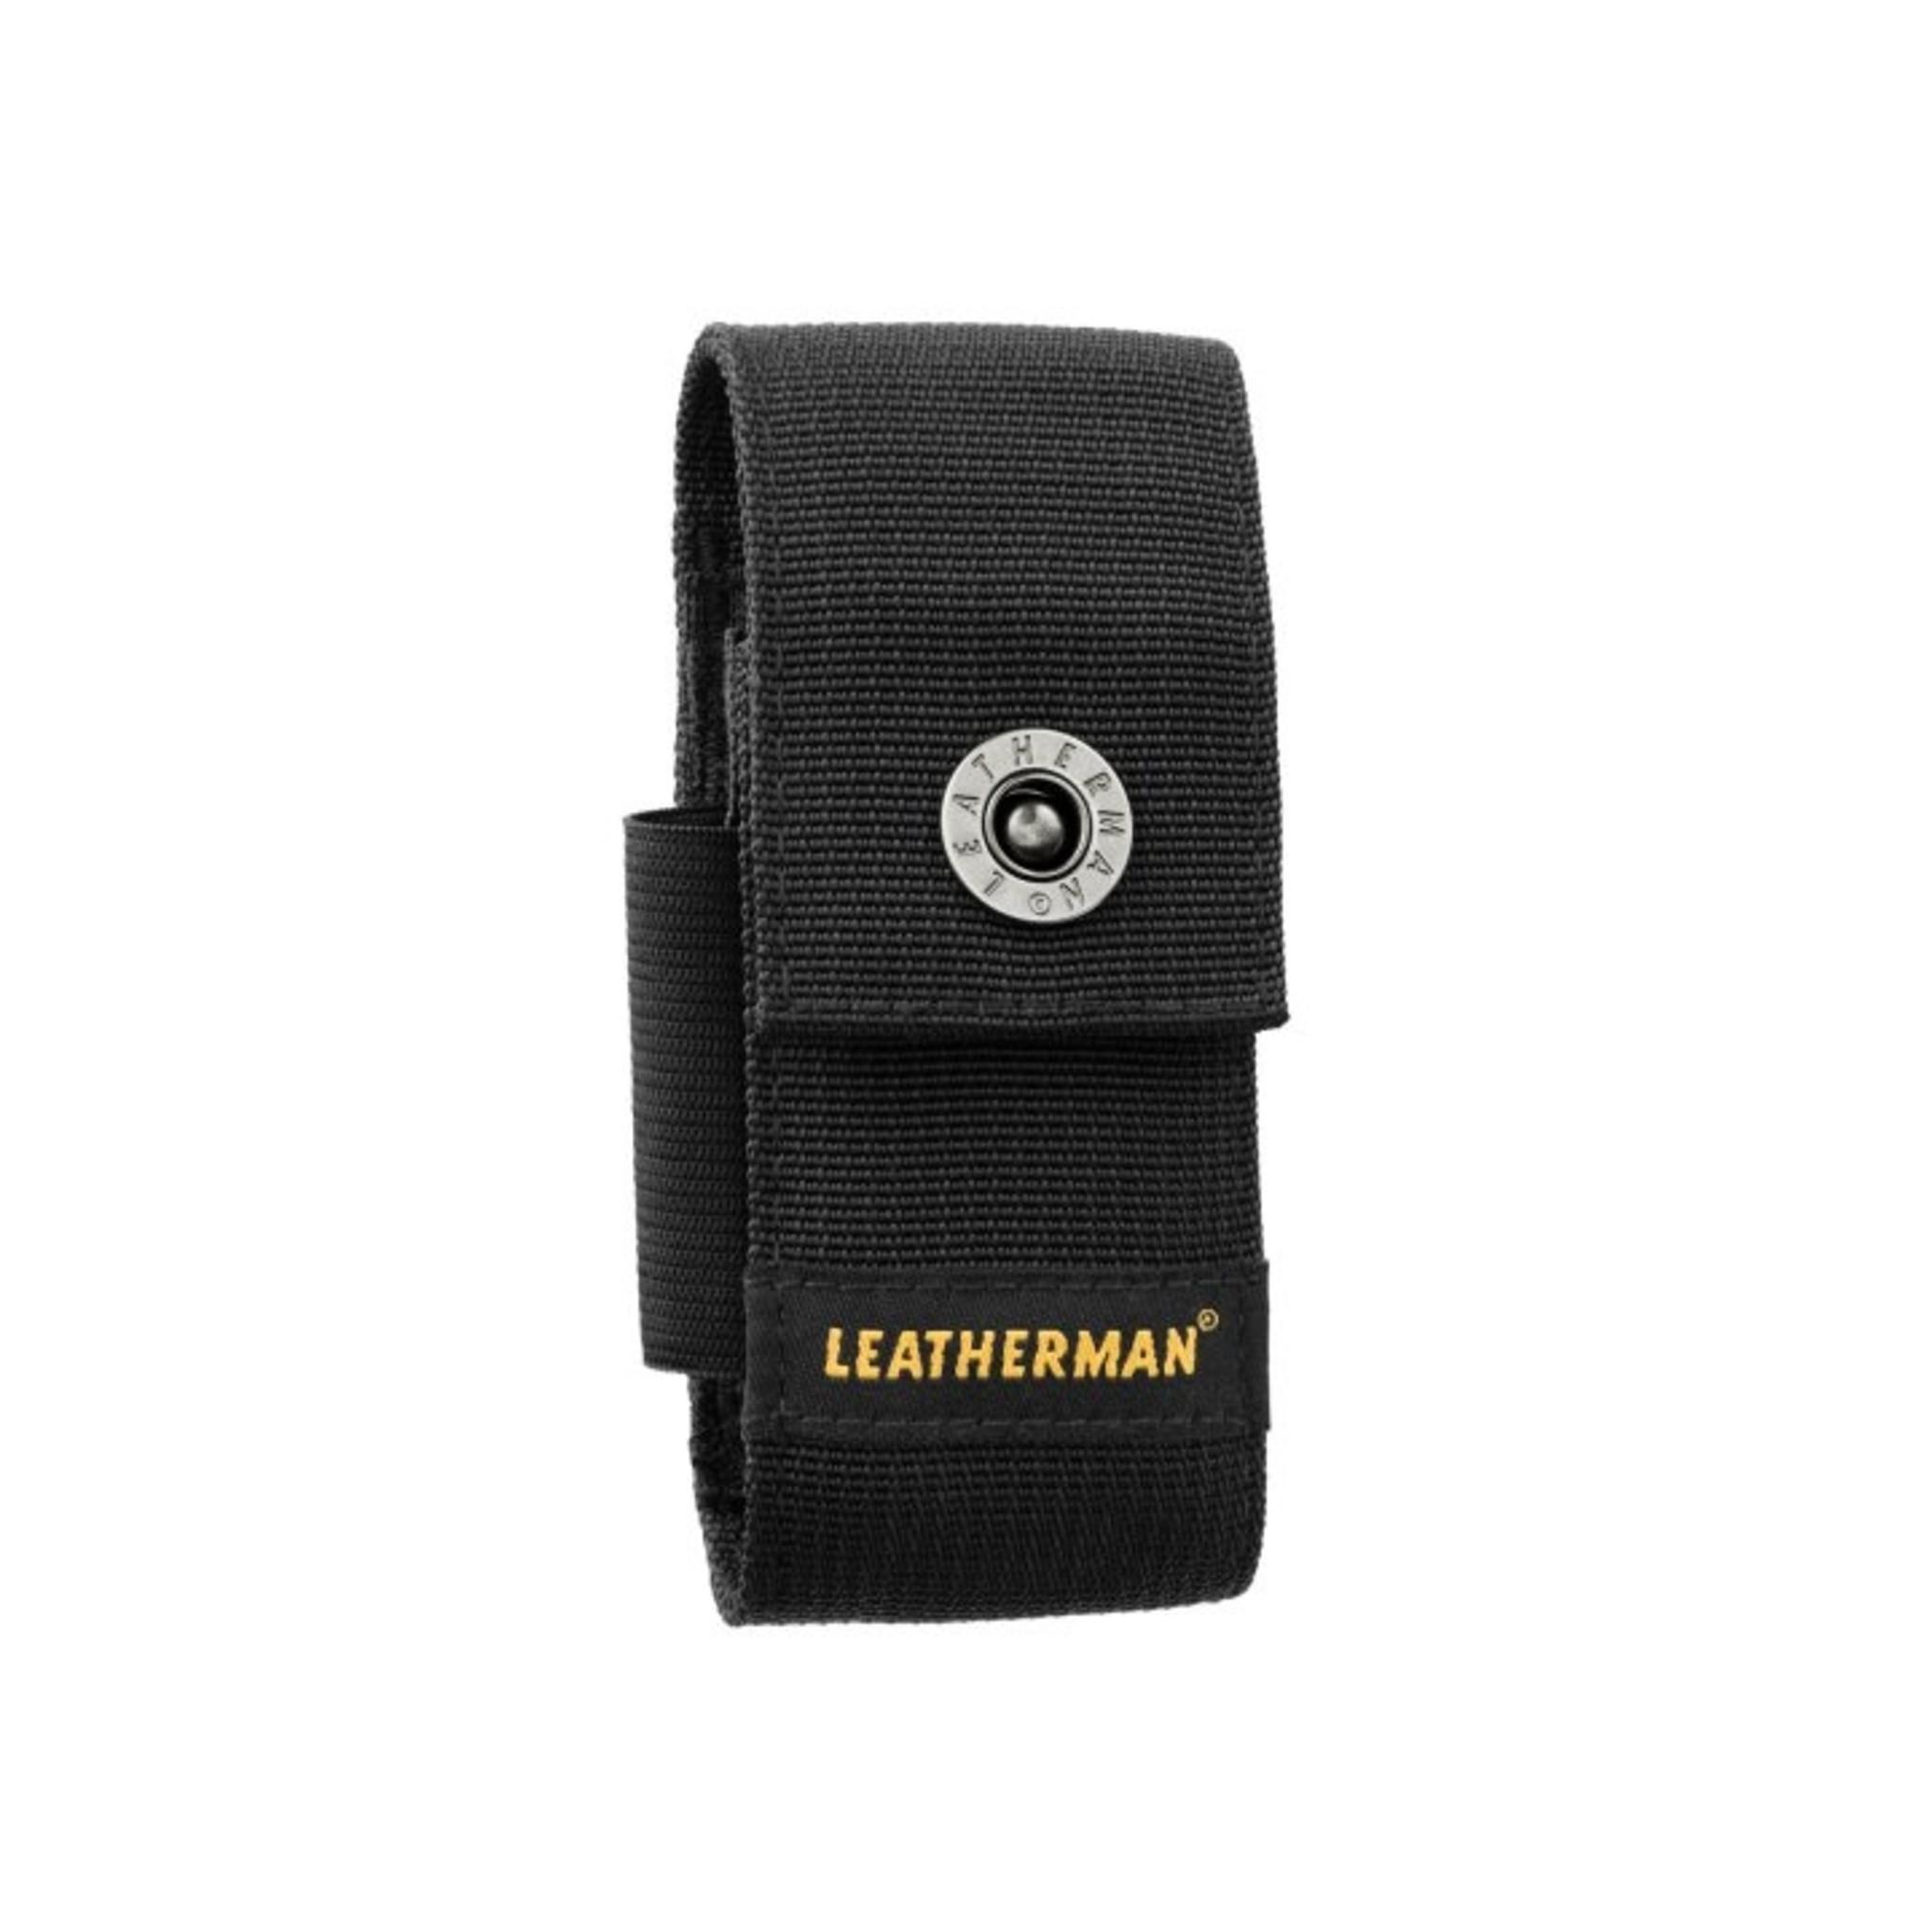 Leatherman® Sheath 4 pocket Nylon - L